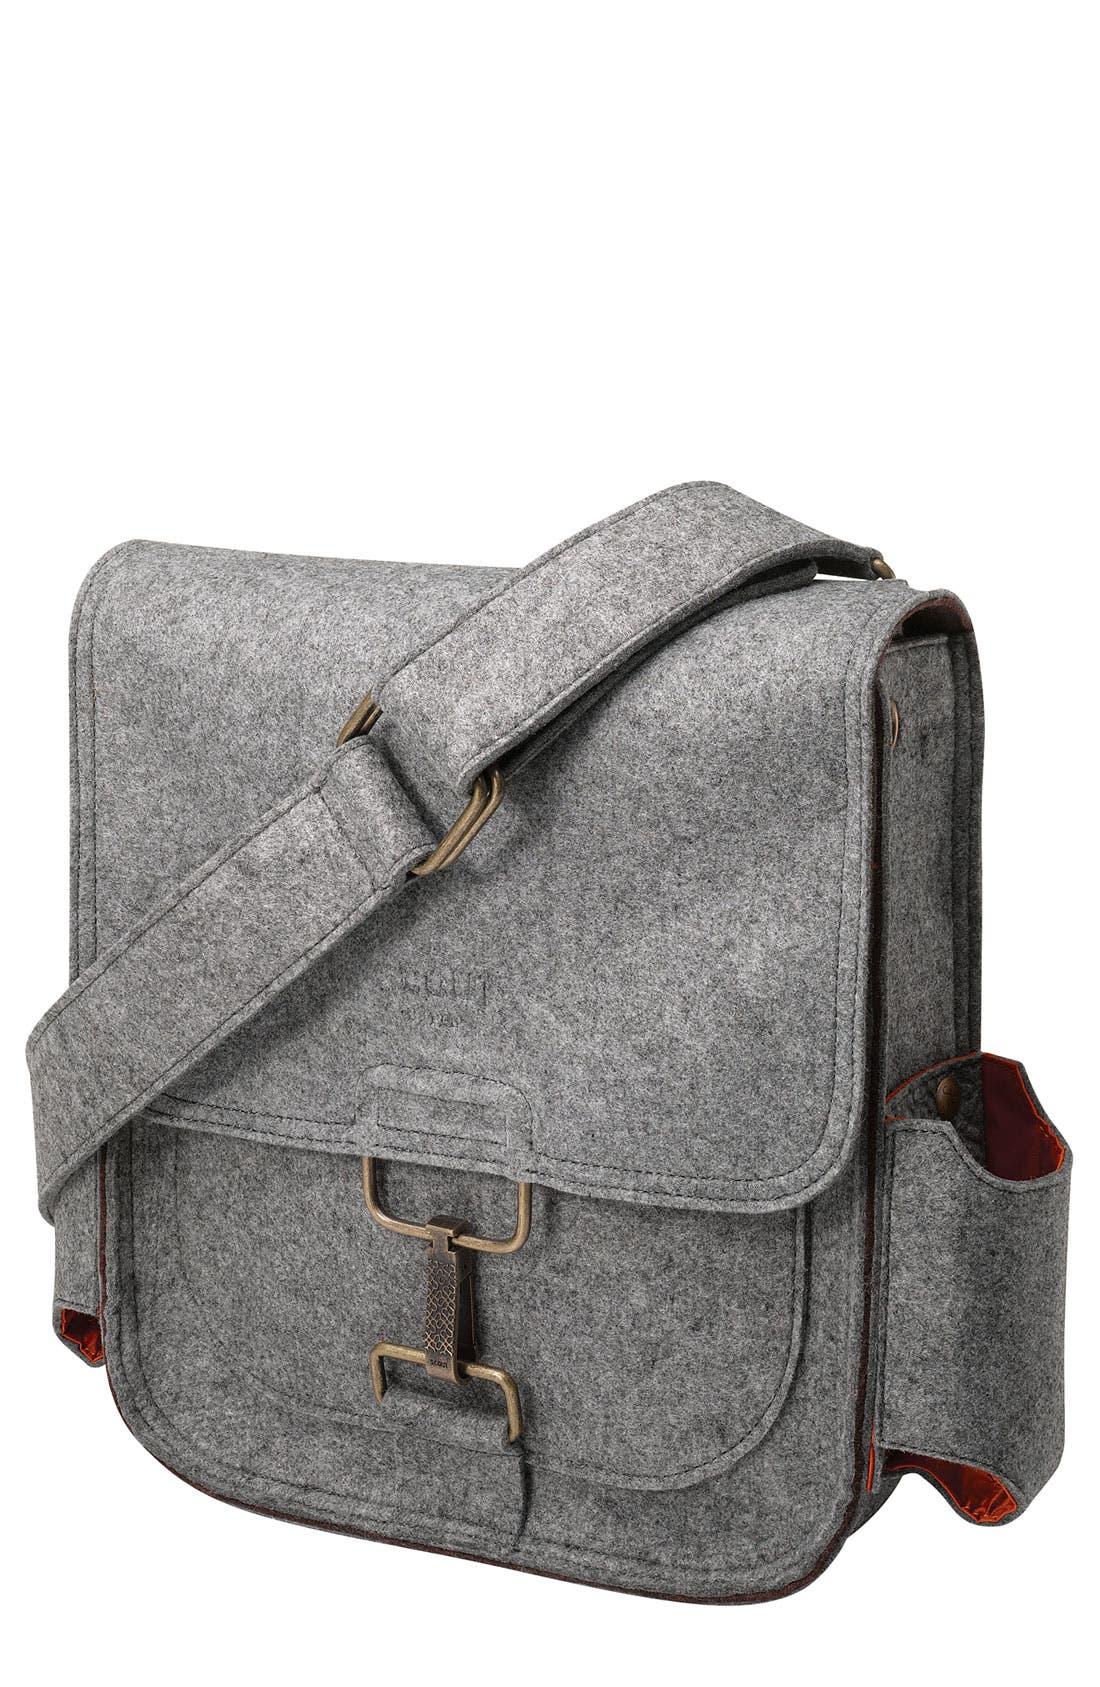 Main Image - Petunia Pickle Bottom 'Scout Journey Pack ' Diaper Bag